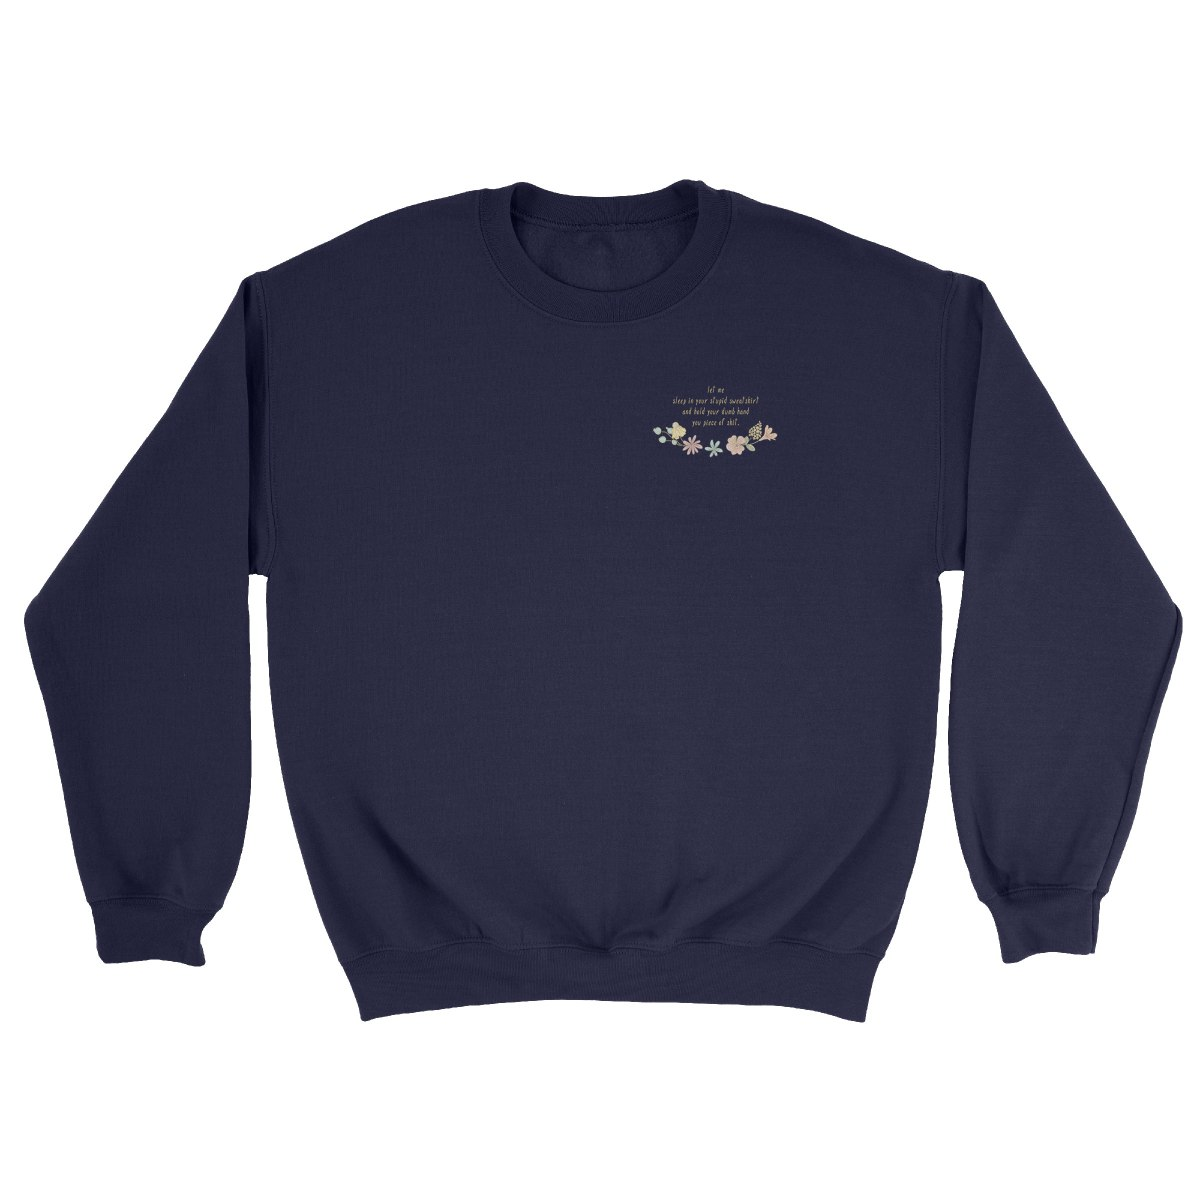 YOUR STUPID SWEATSHIRT navy crew sweatshirt by kikicutt